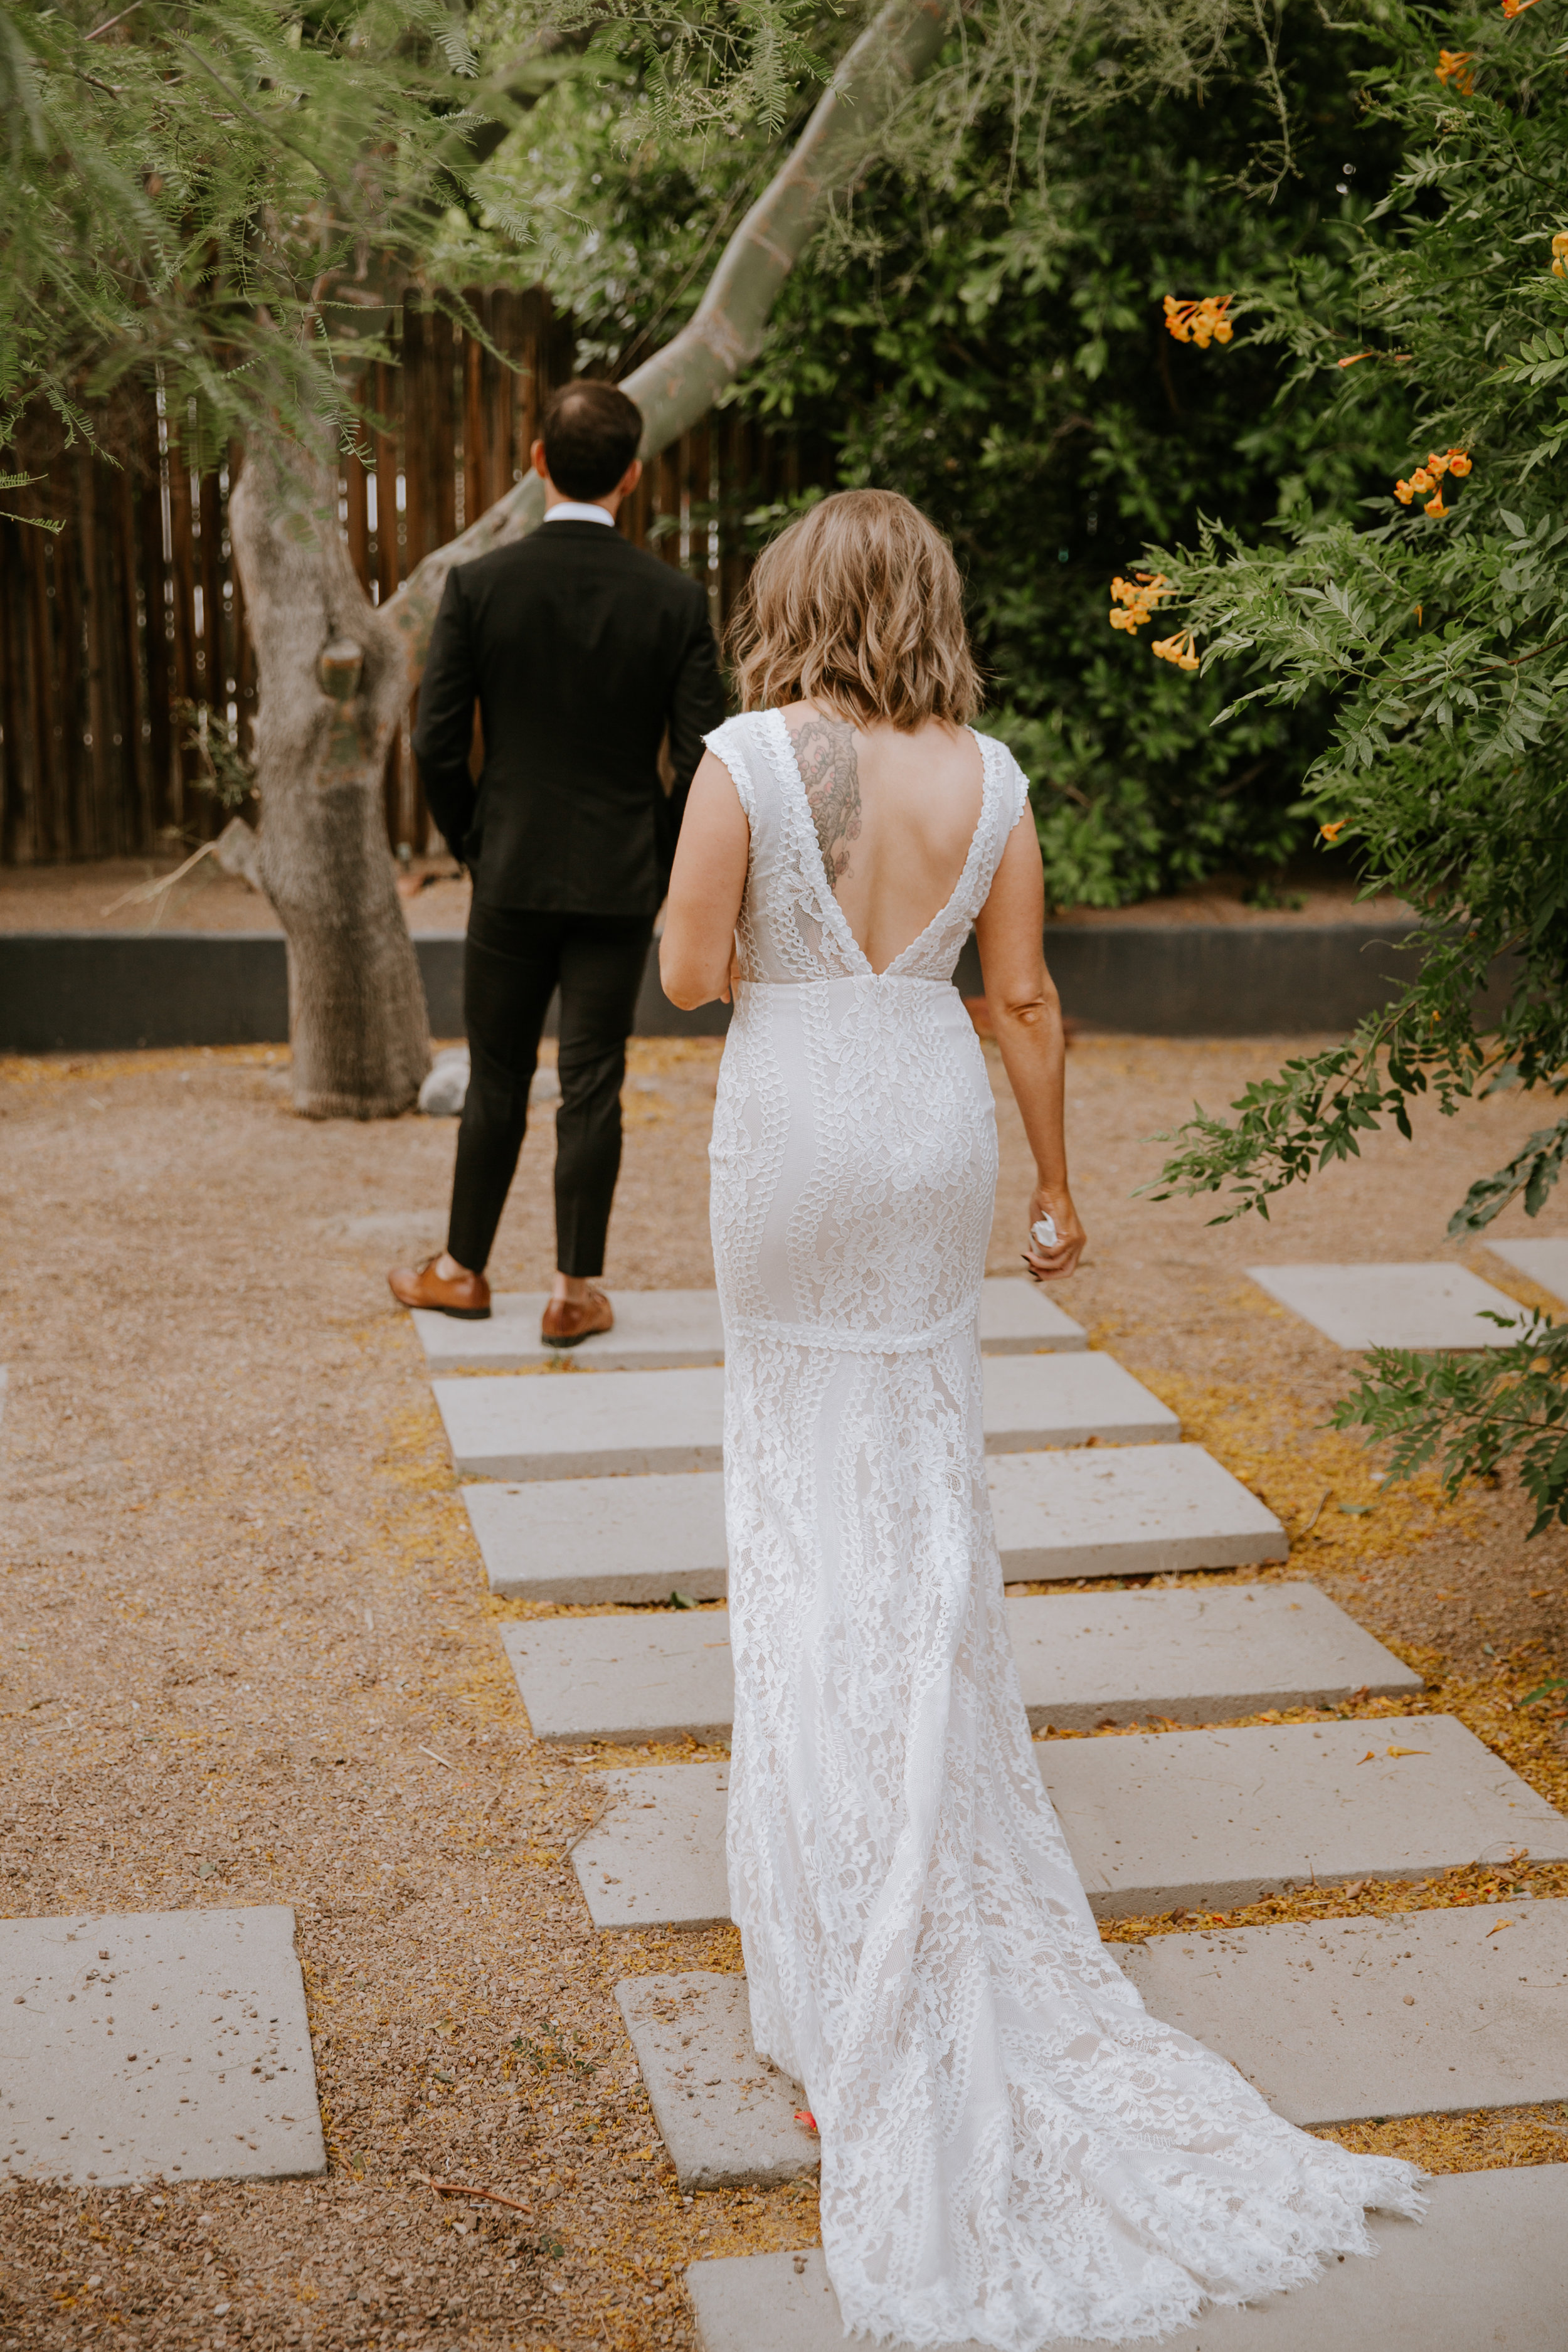 2019-05-26_Callie-Evan_Wedding_Joshua Tree_Paige Nelson_PREVIEWS HR-19.jpg